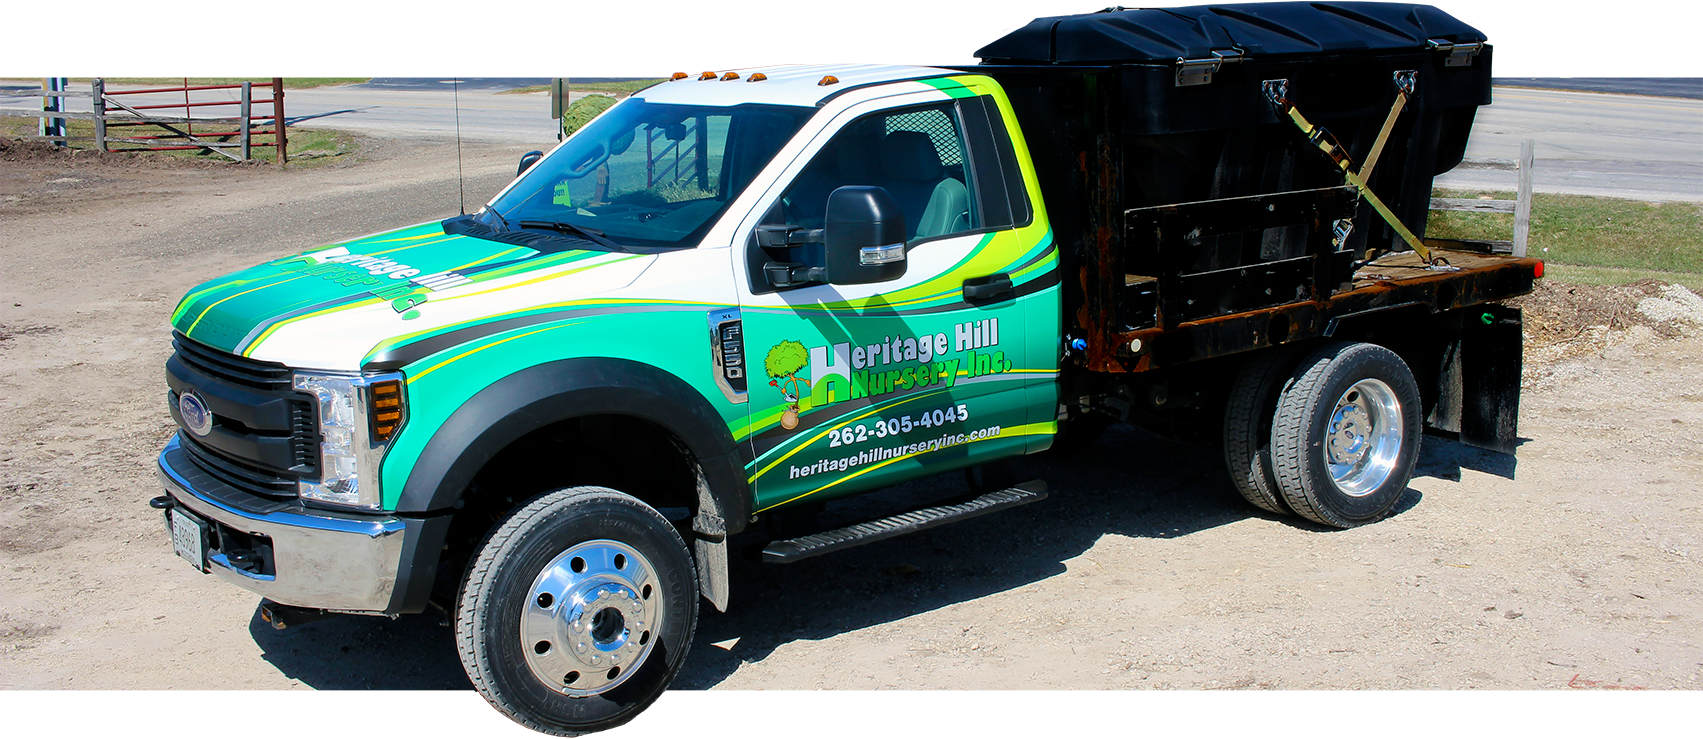 Heritage Hill Nursery Inc. vinyl truck wrap (Cedarburg, WI).